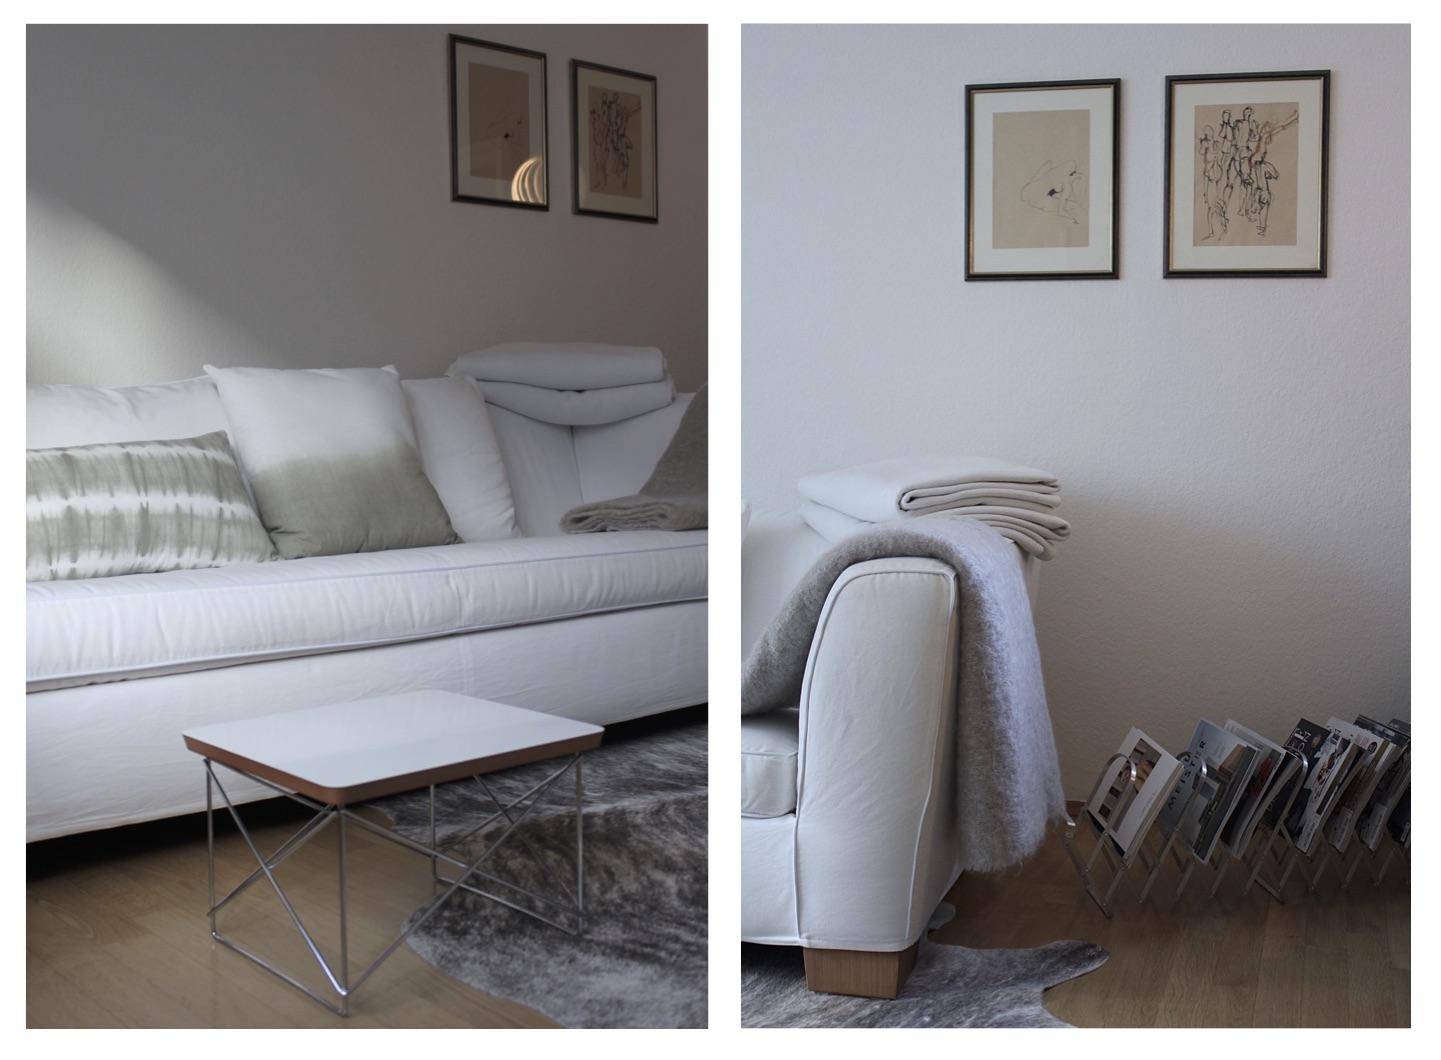 Sofa und So